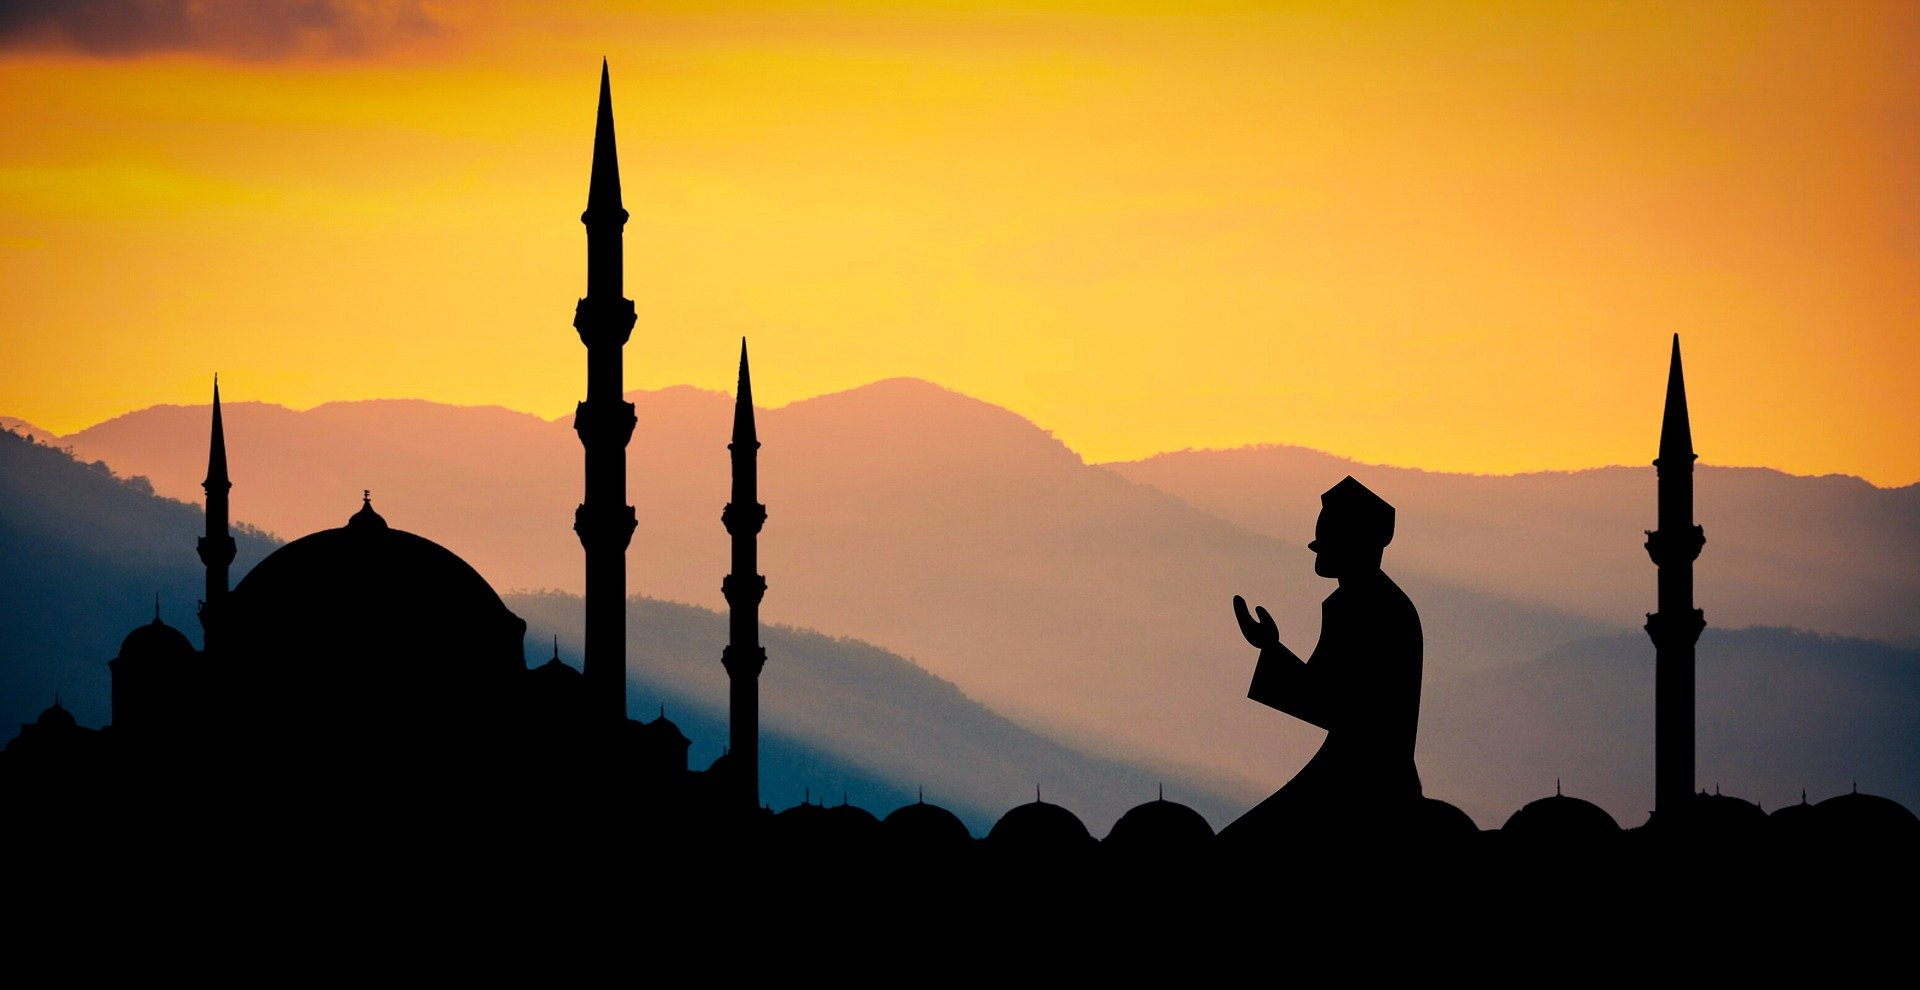 Musulman en train de prier, un incontournable du ramadan